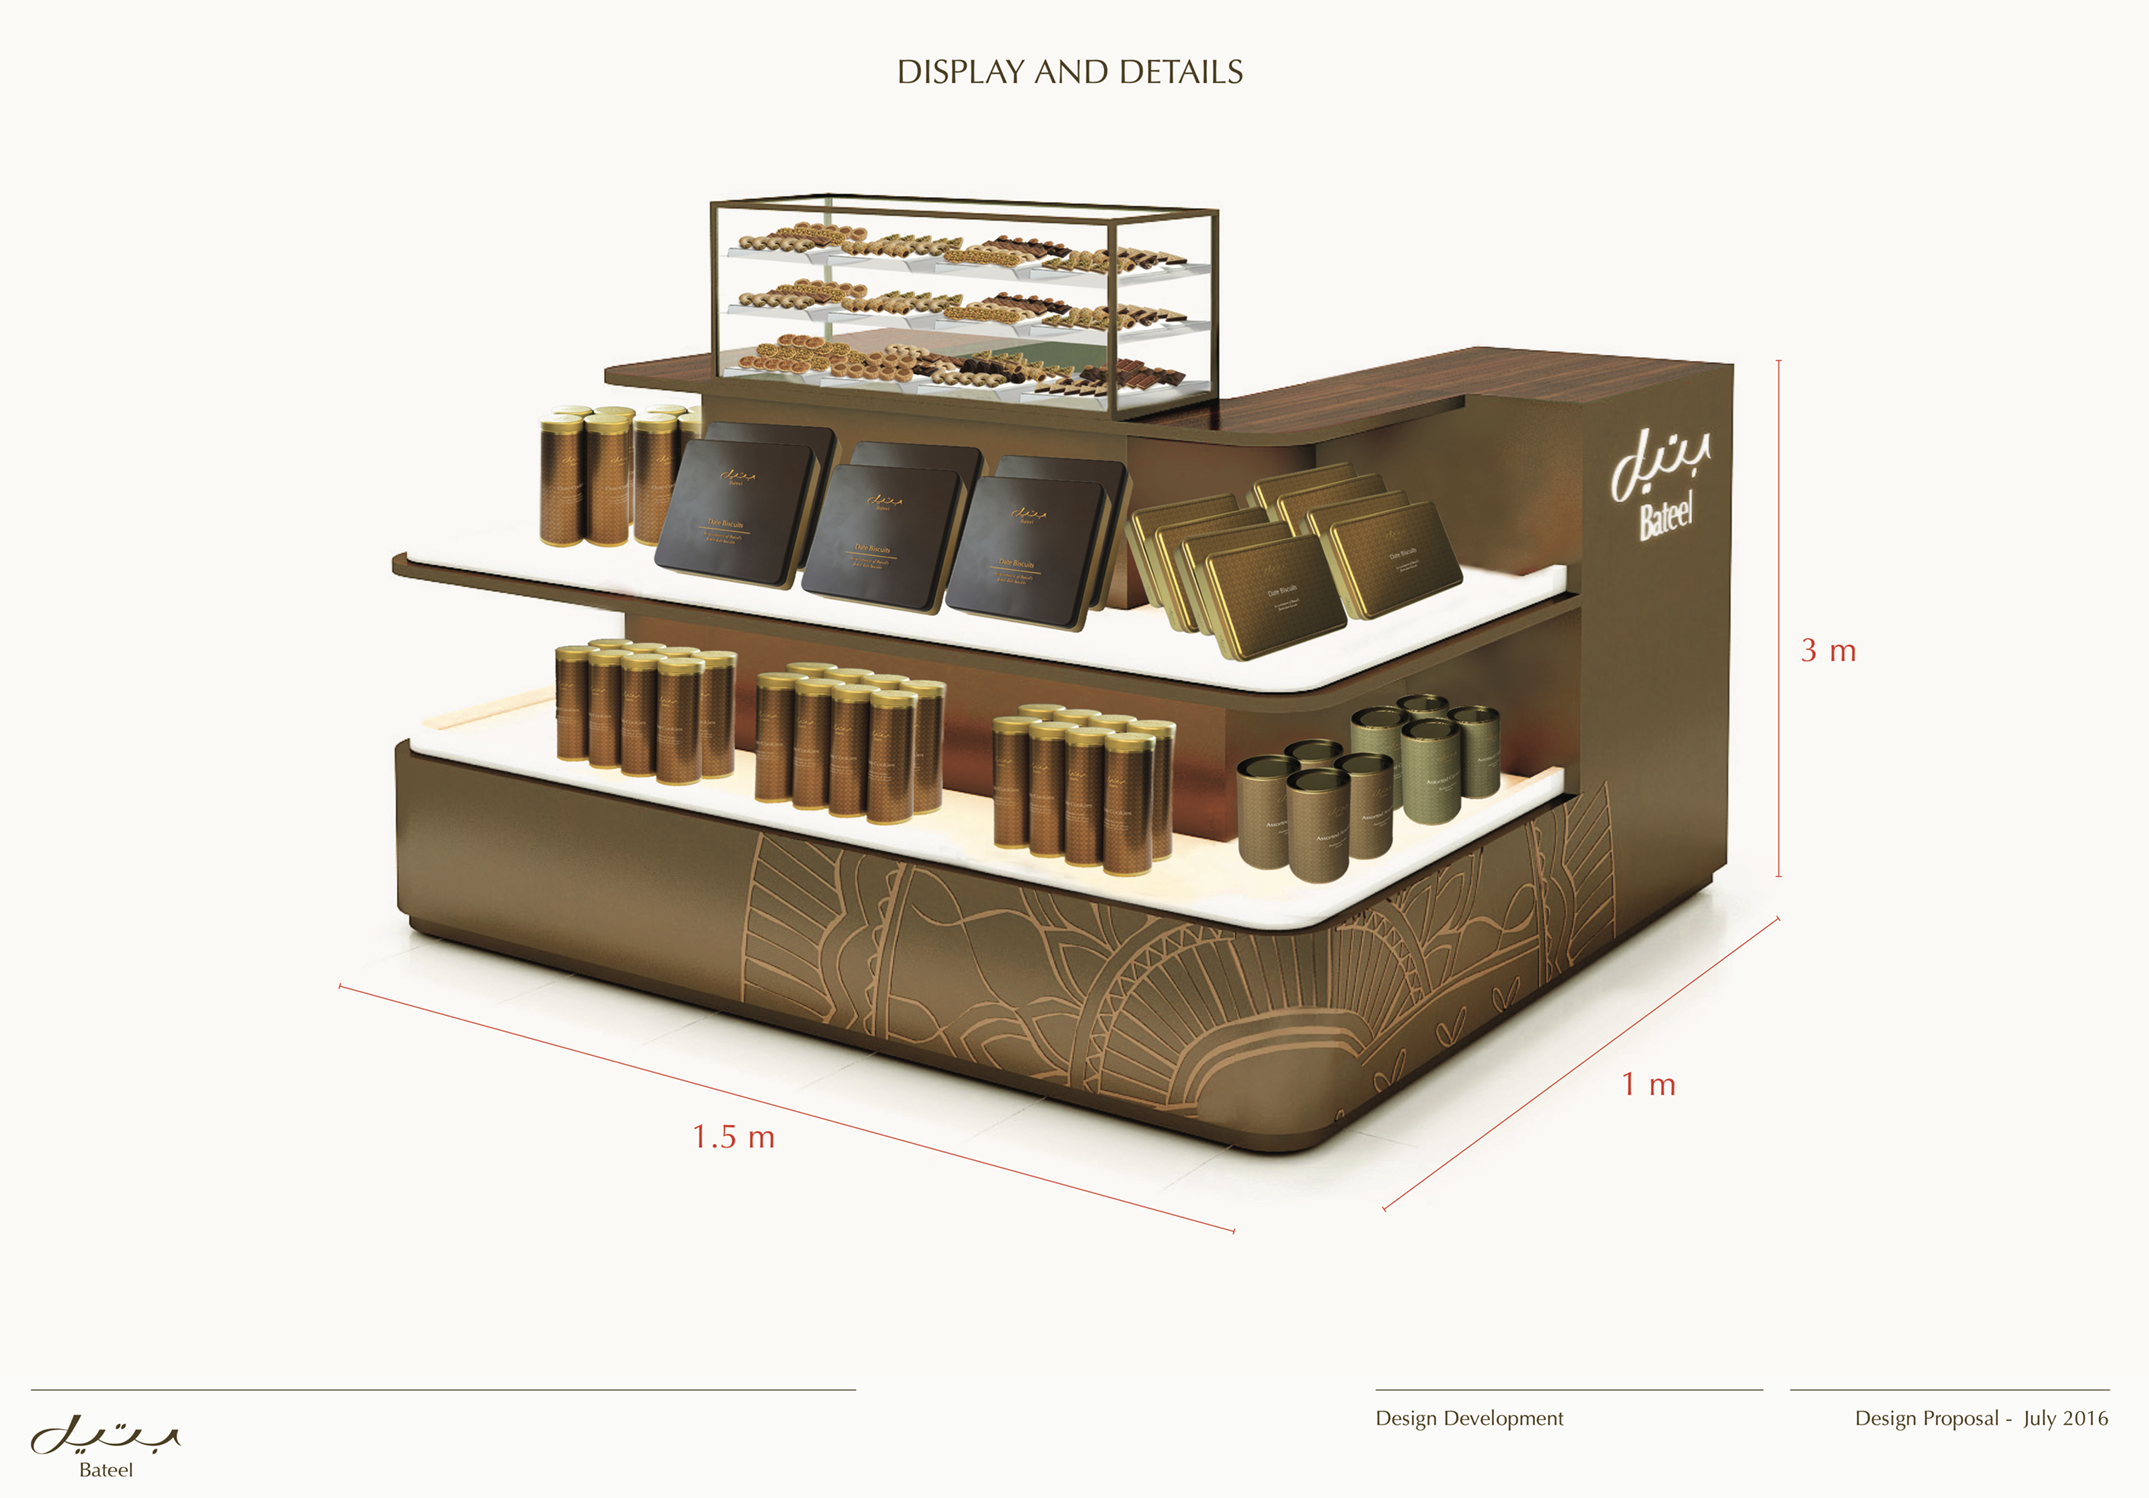 Dutyfree Kiosk Design